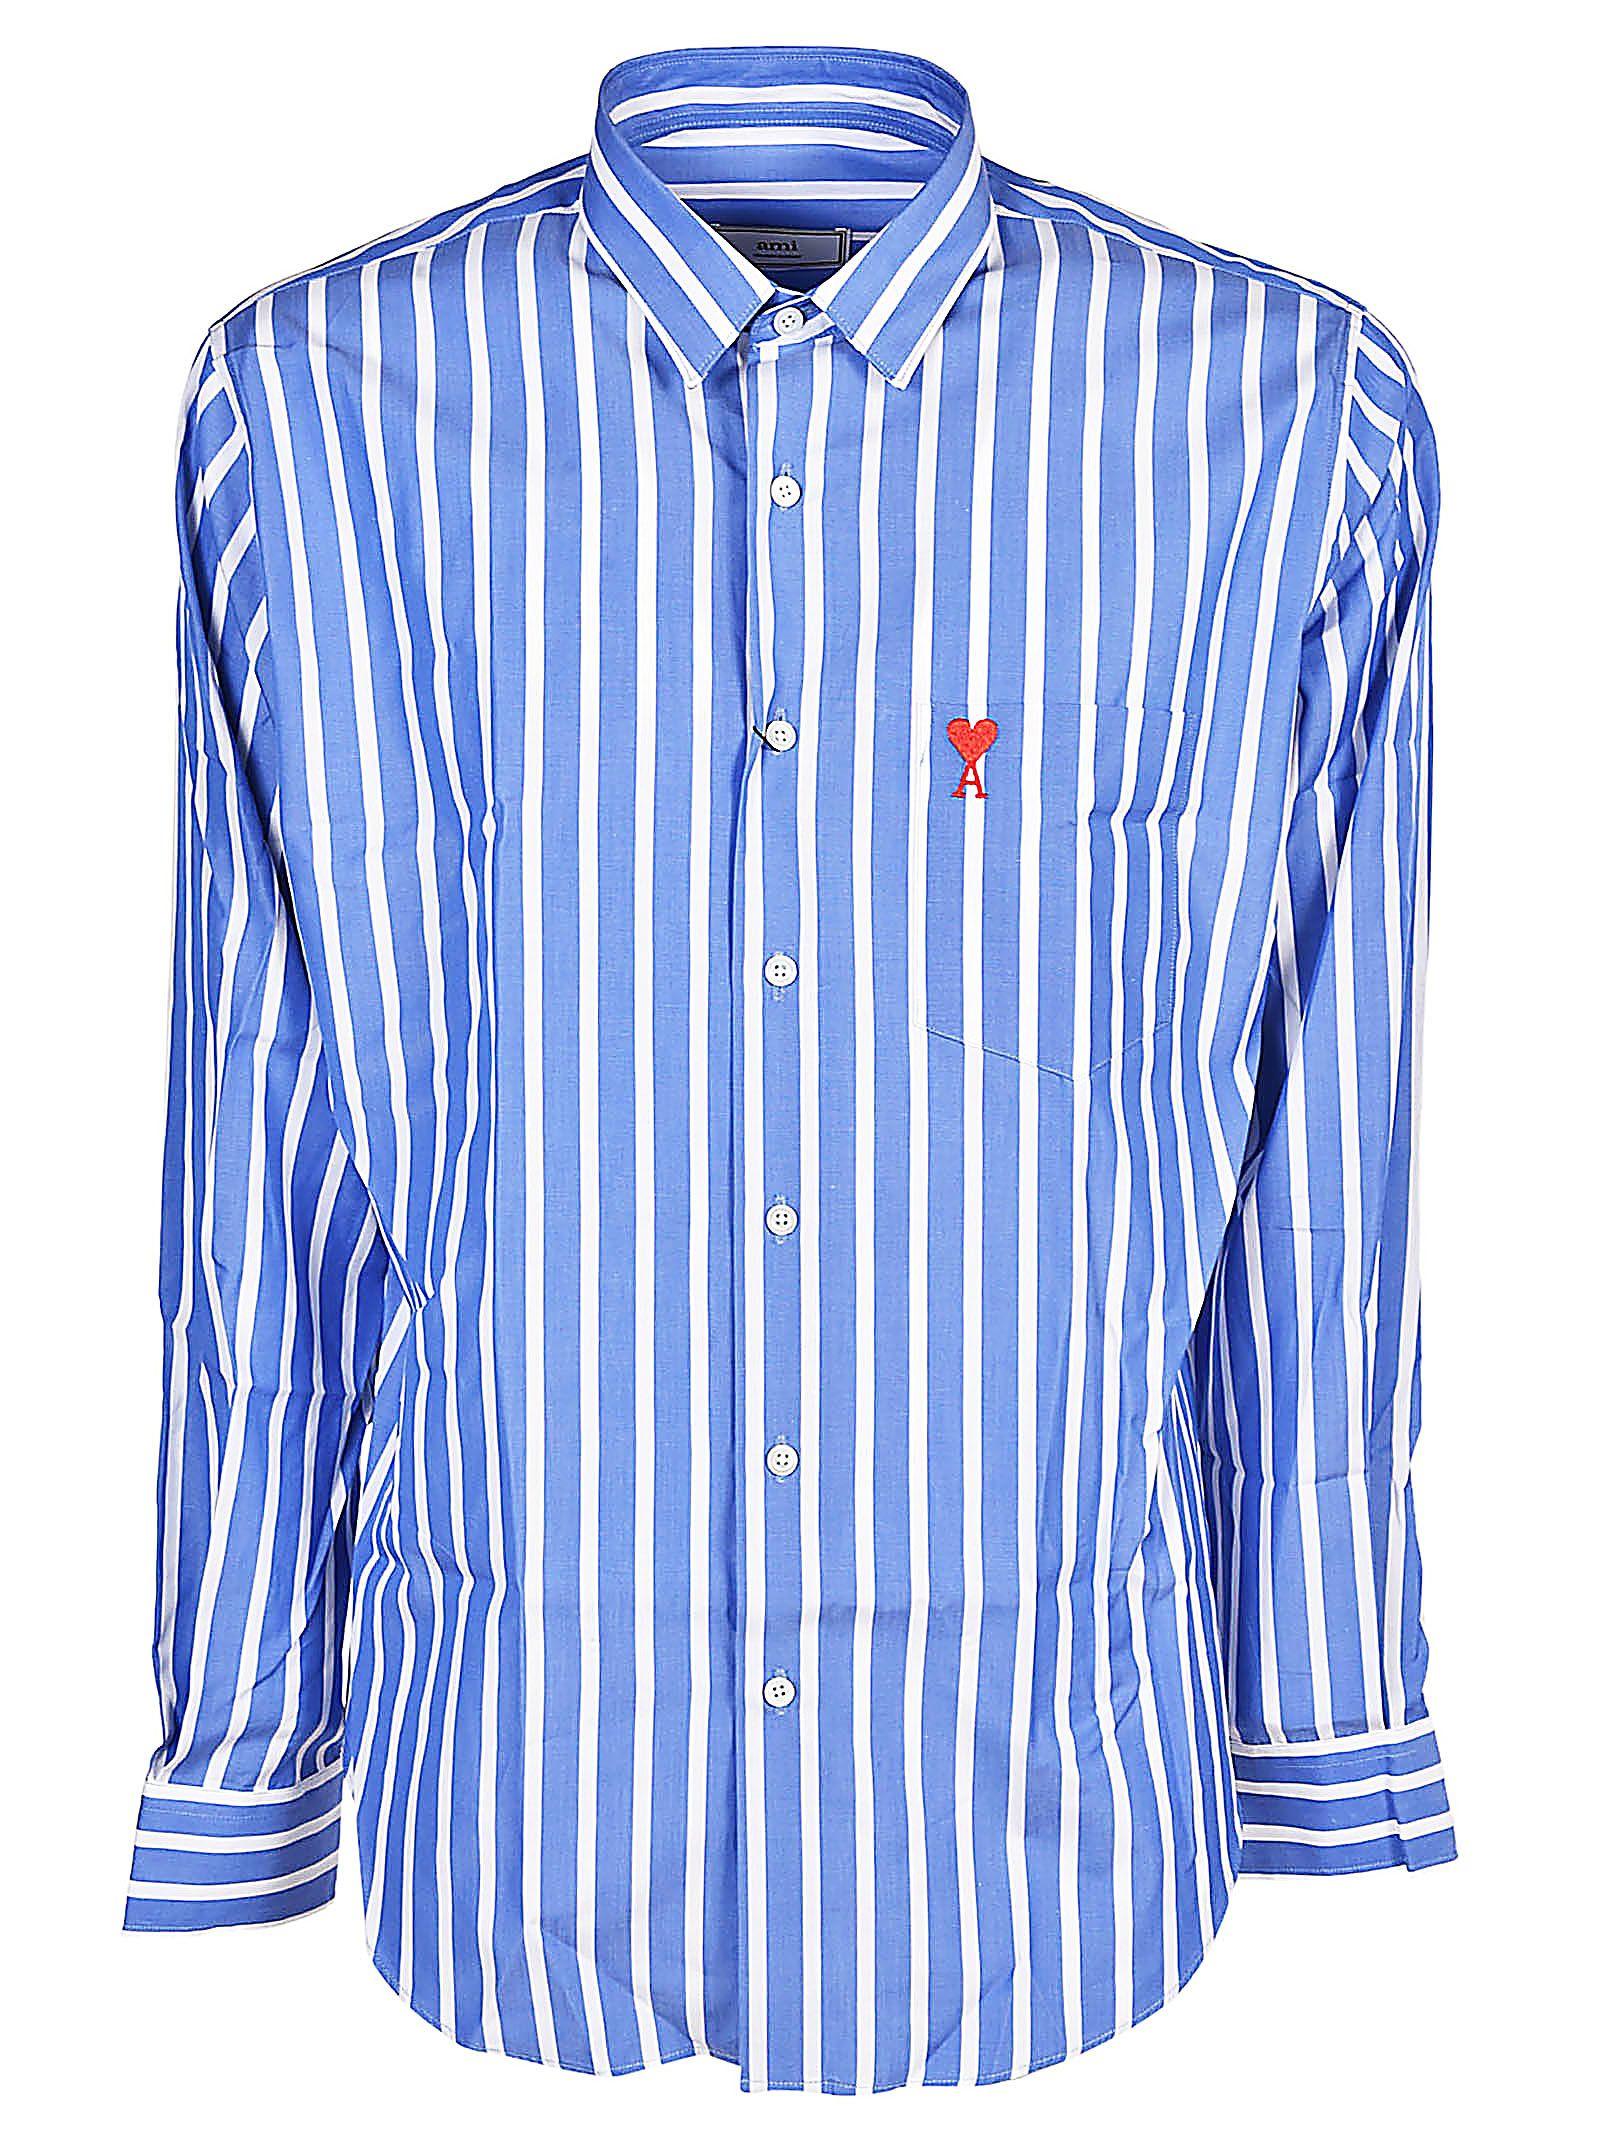 Ami Alexandre Mattiussi Striped Shirt